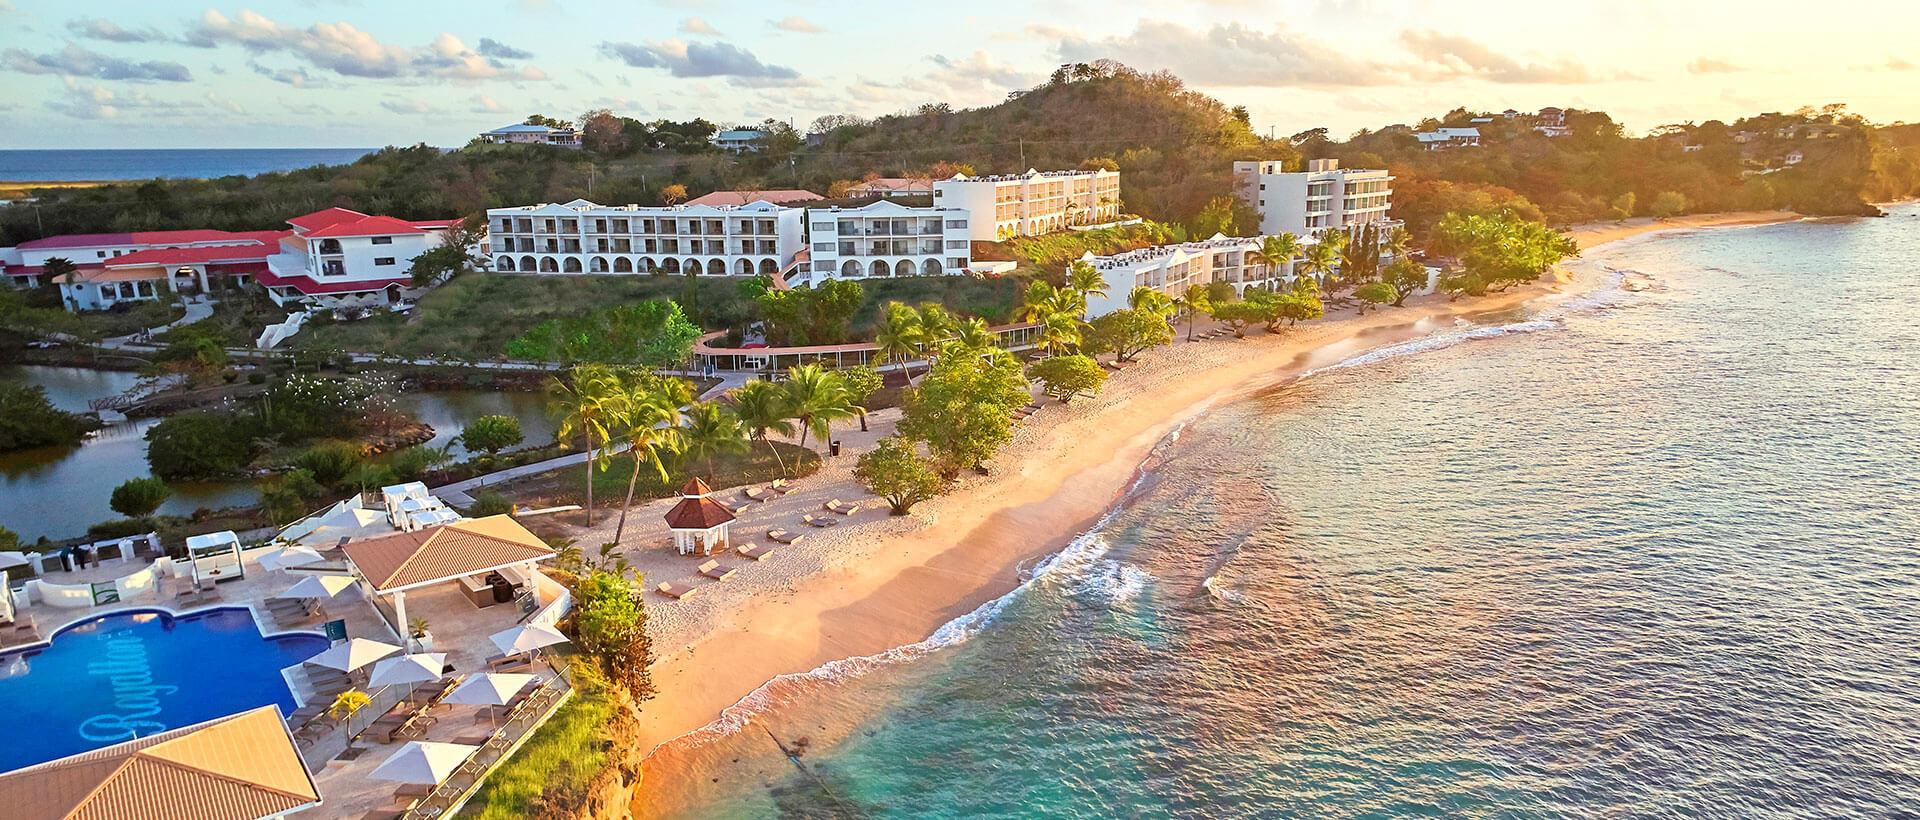 Royalton Grenada, An Autograph Collection All-Inclusive Resort